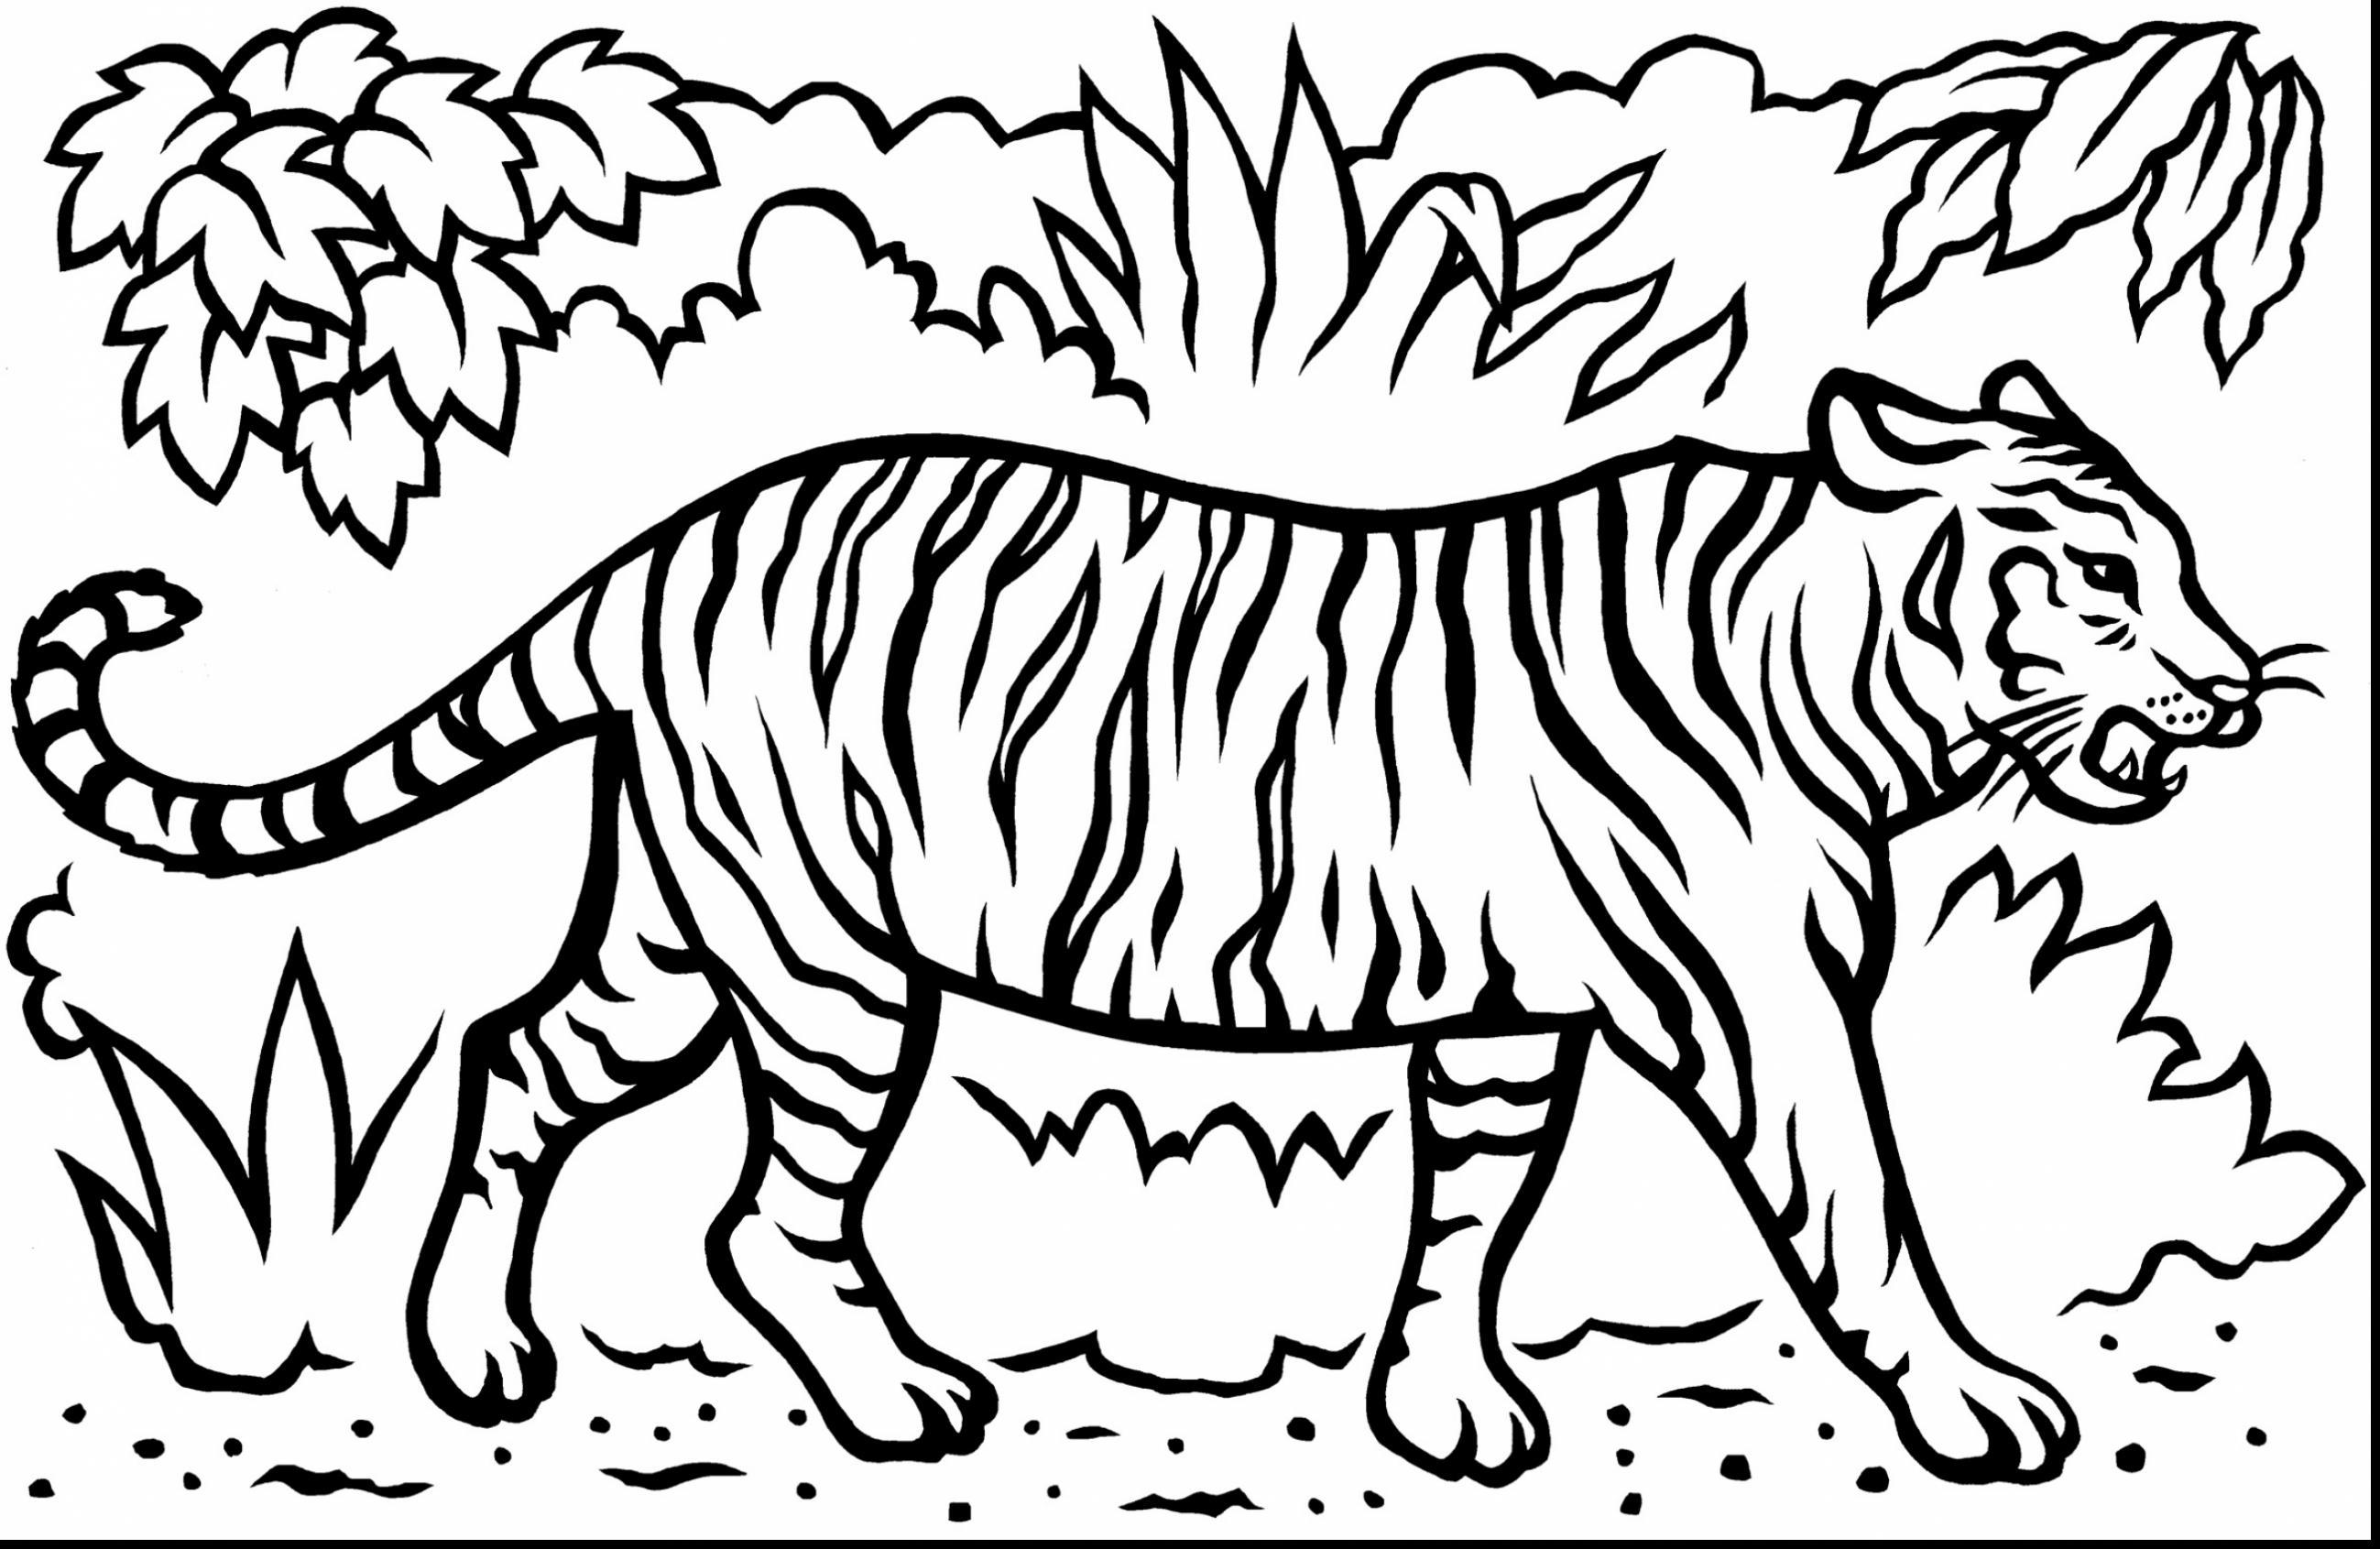 tiger coloring page free printable tiger coloring pages for kids tiger coloring page 1 1